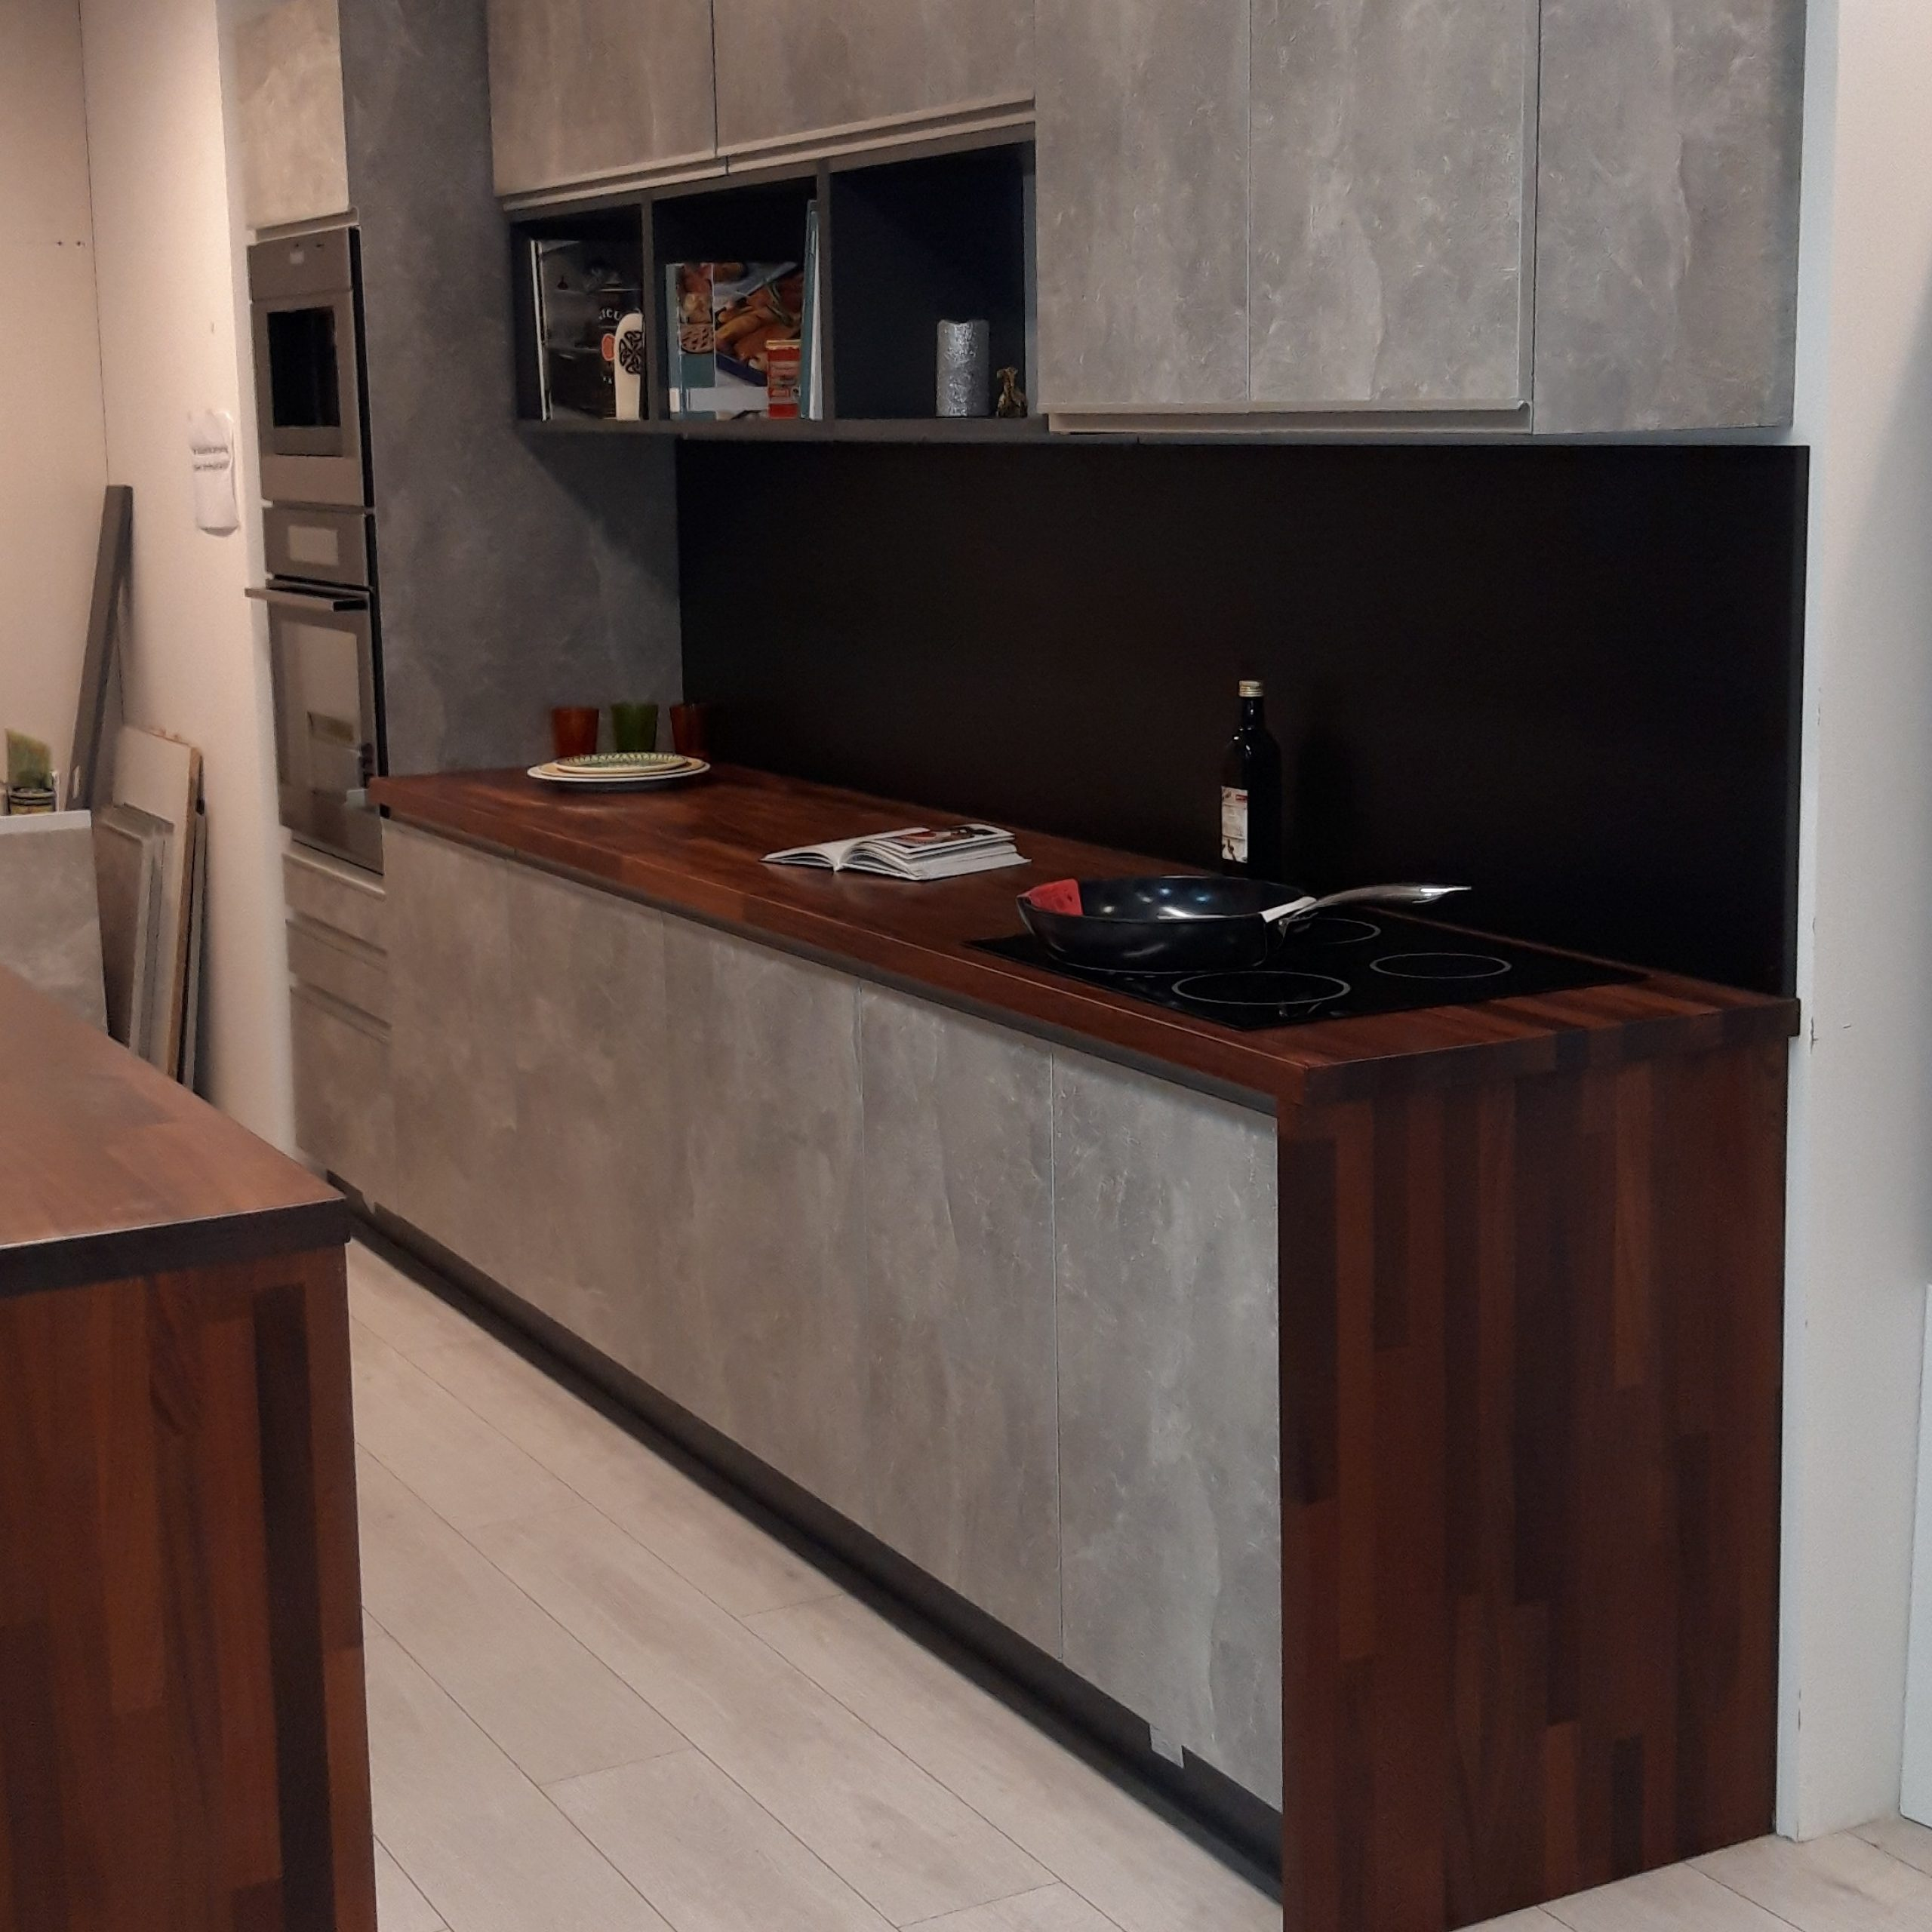 Modern konyhabútor akciós áron